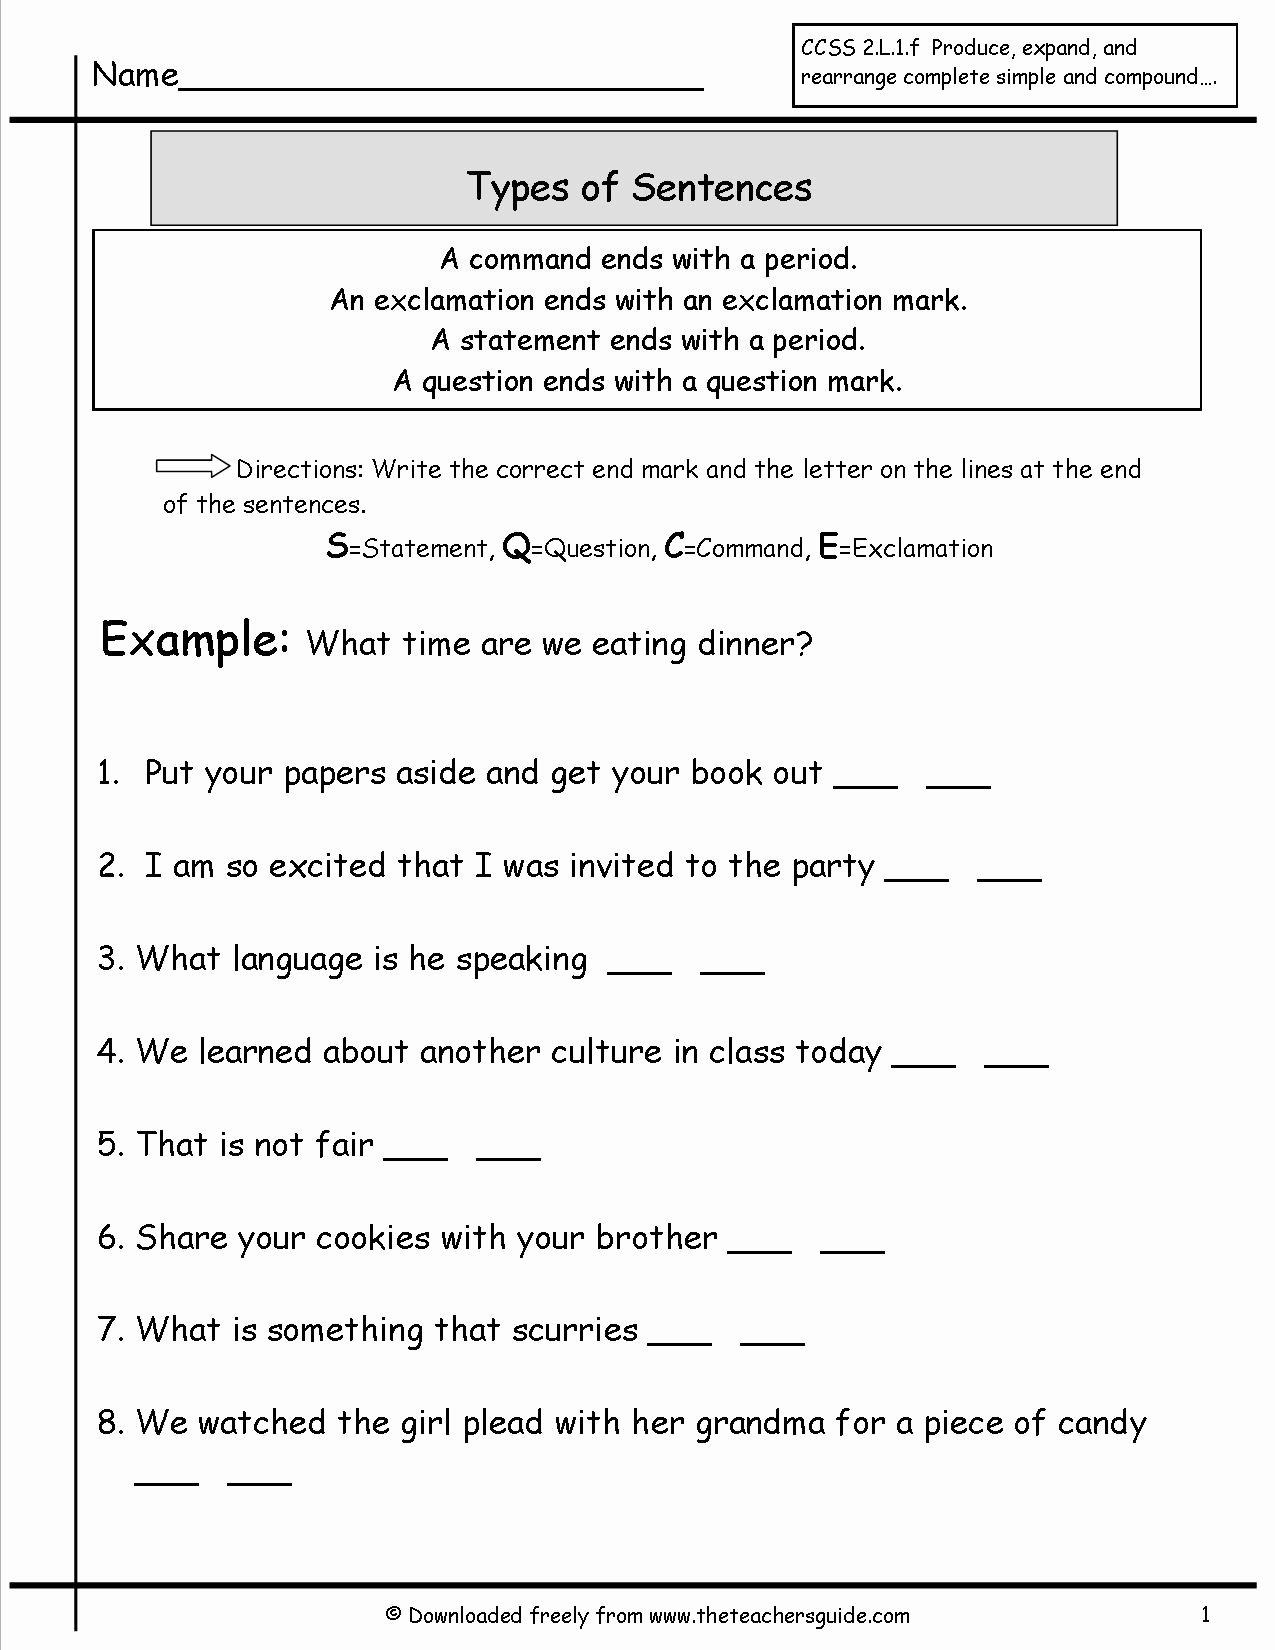 Four Types Of Sentences Worksheet Luxury Sentences Worksheets From the Teacher S Guide